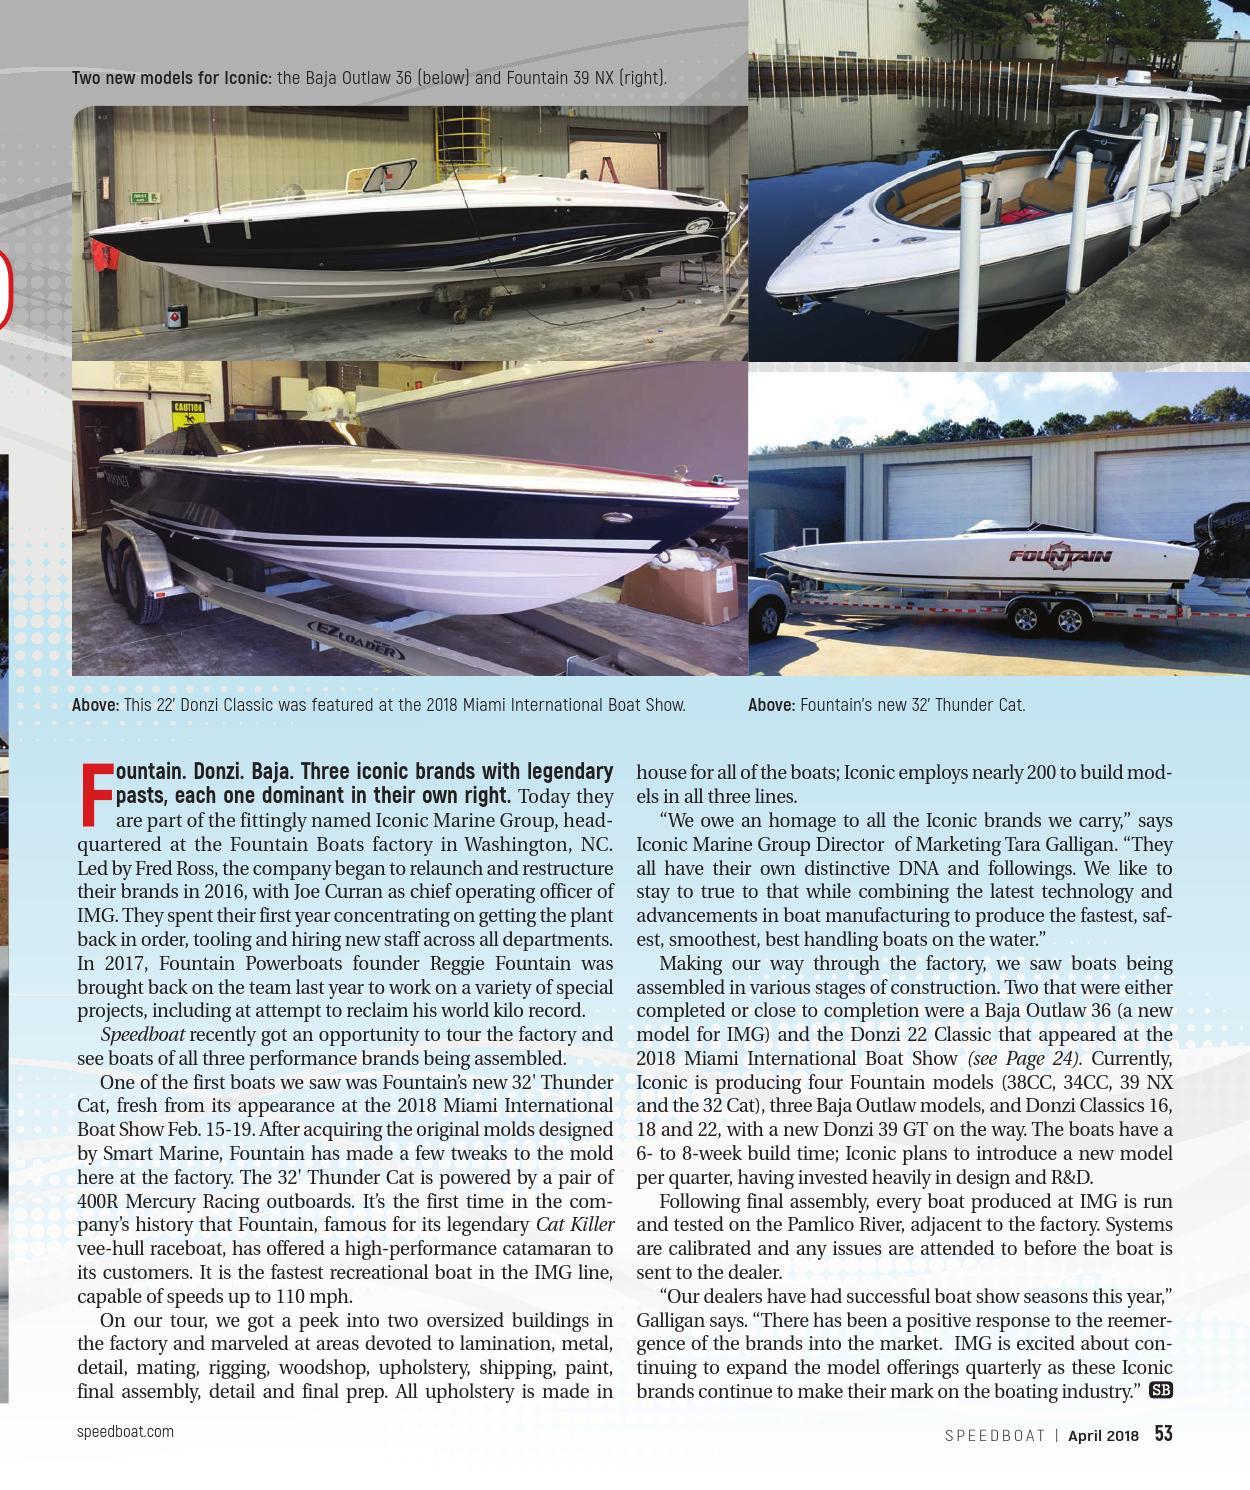 Speedboat April 2018 by Brett Bayne - issuu